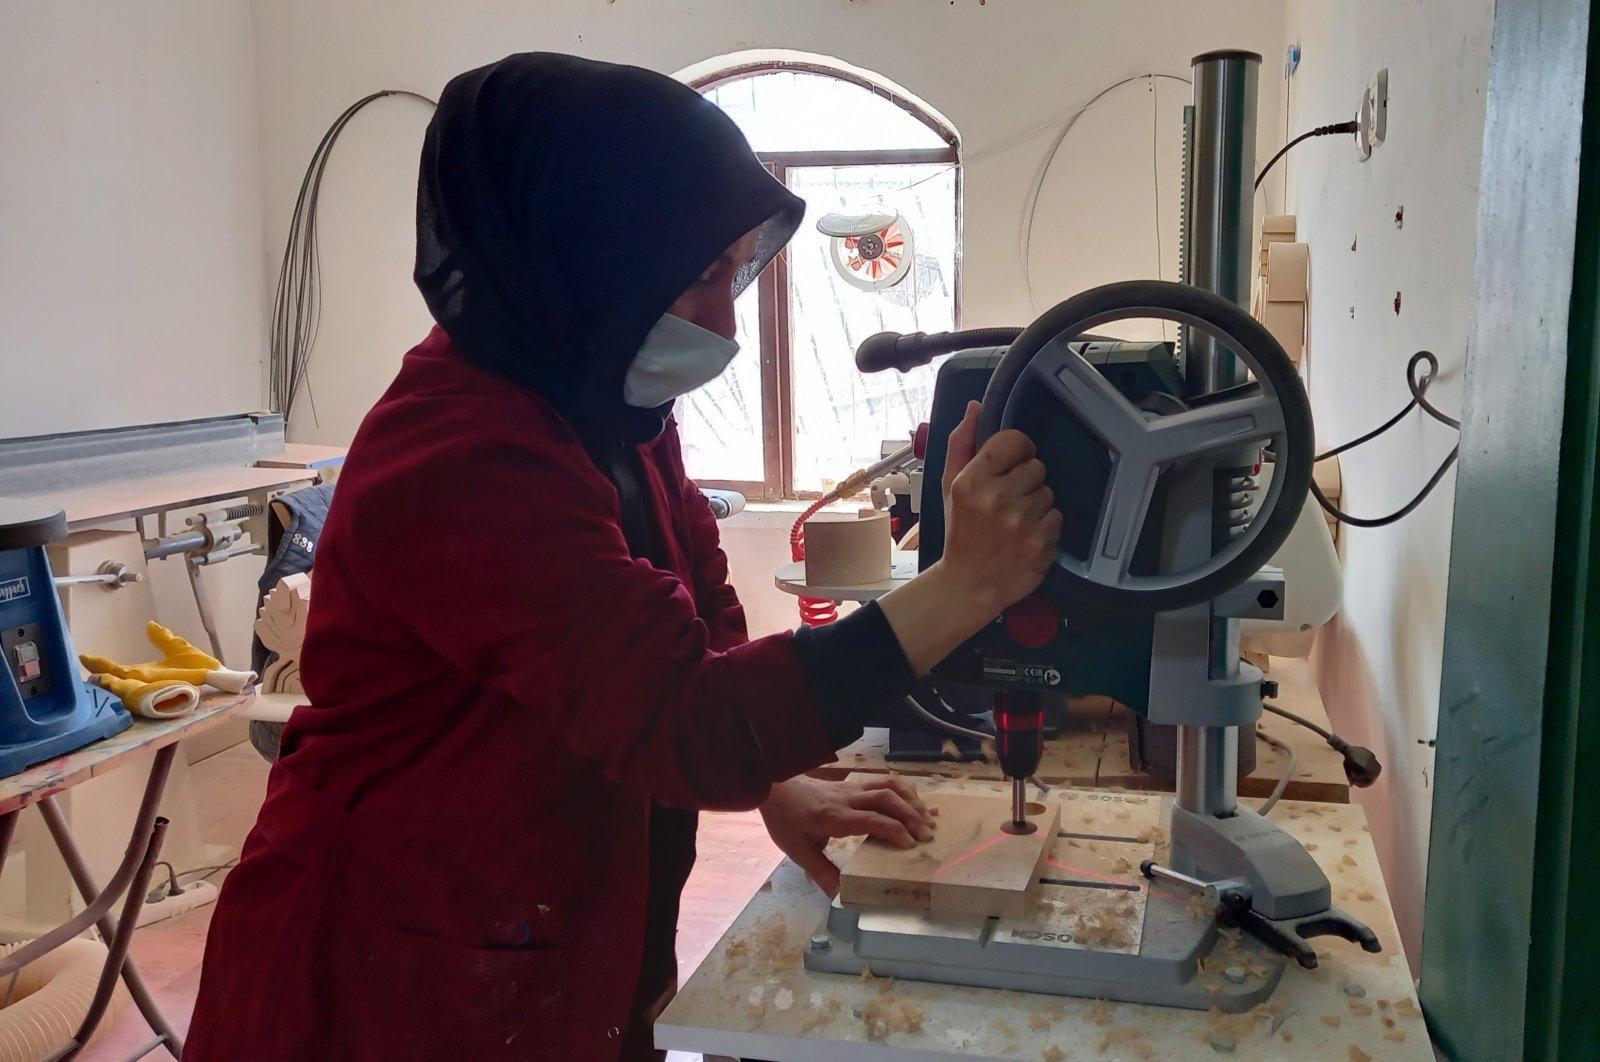 Emine Şimşek, an entrepreneur, works in her workshop where she produces and exports wooden toys, in Kırıkkale, central Turkey, Feb. 28, 2021. (IHA PHOTO)